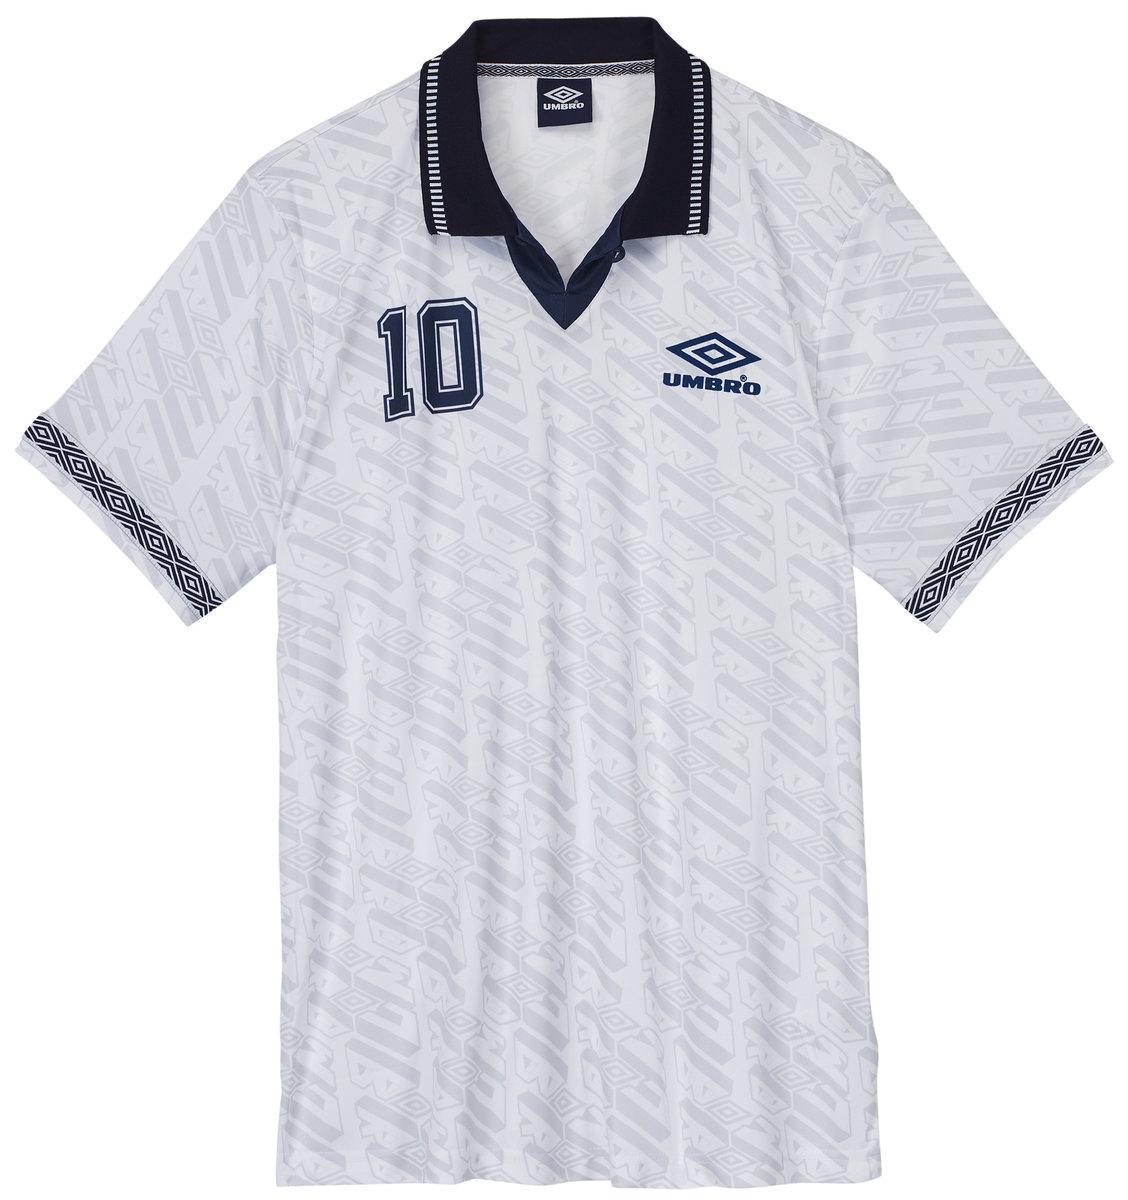 NUMBER 10 FOOTBALL SHIRT - Sale - Umbro c7bf83967